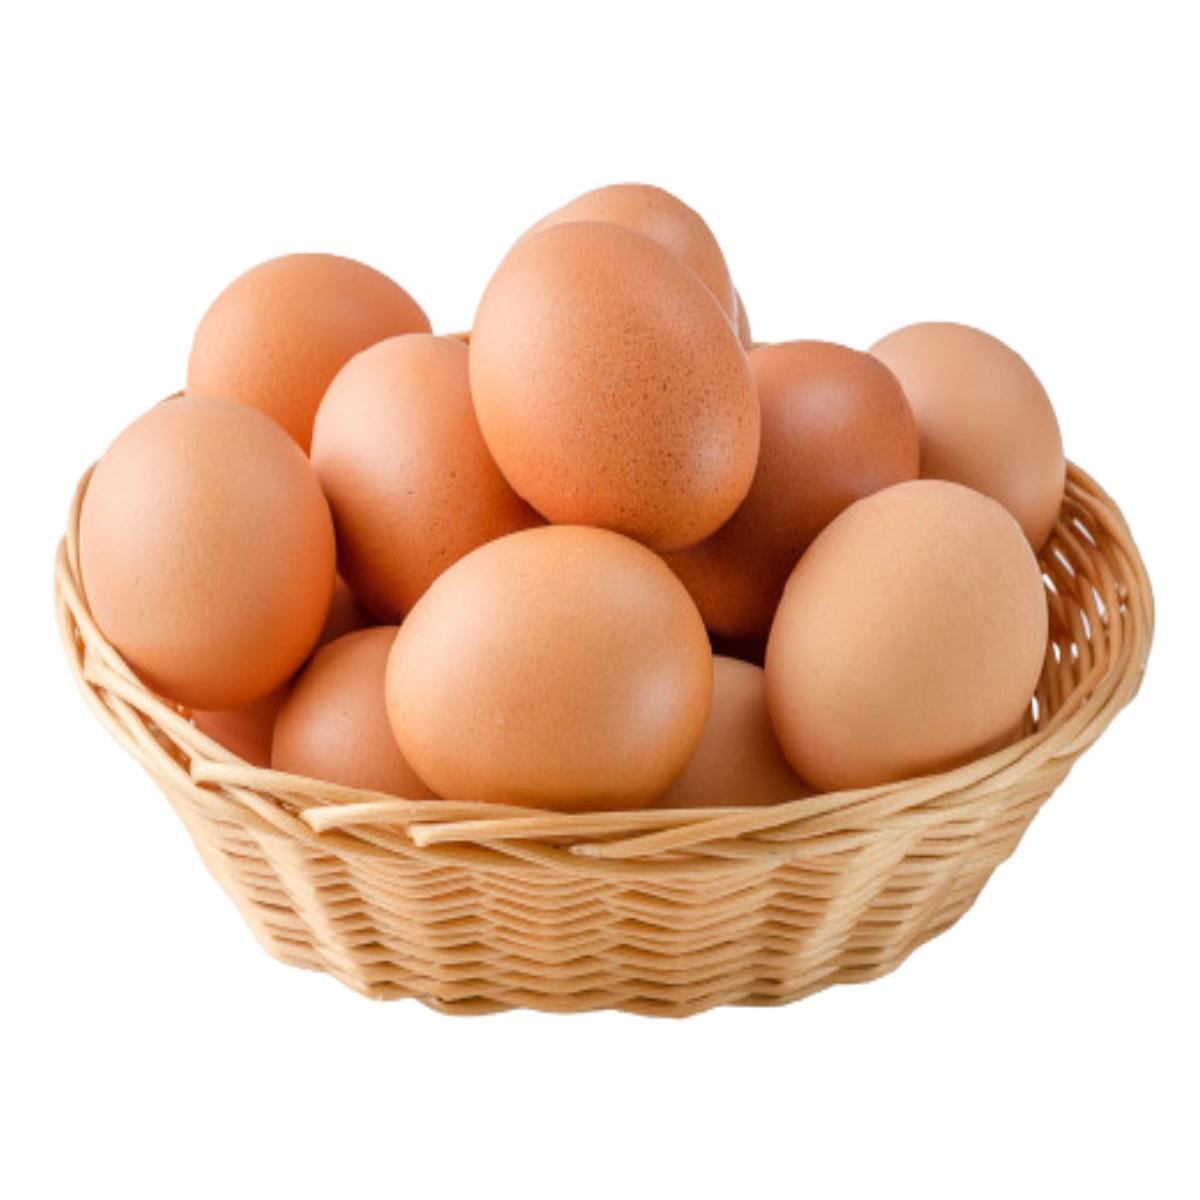 chicken eggs (layer) 12pcs